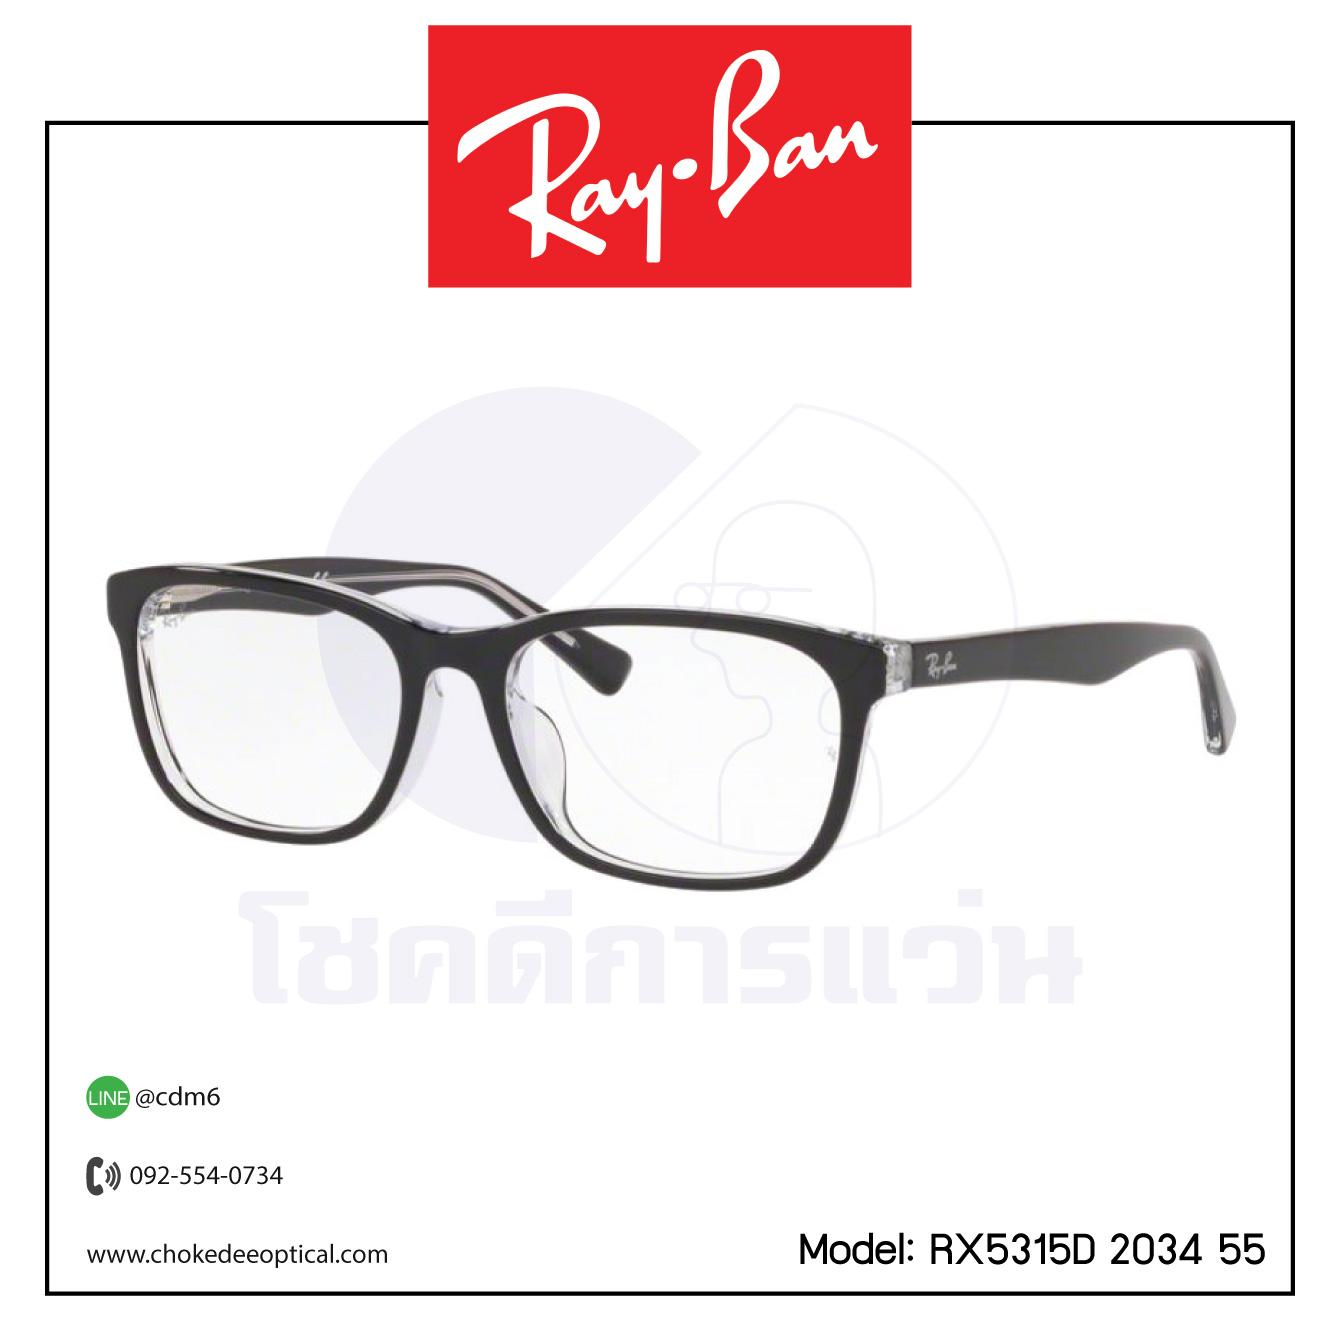 Rayban RX5315D 2034 55